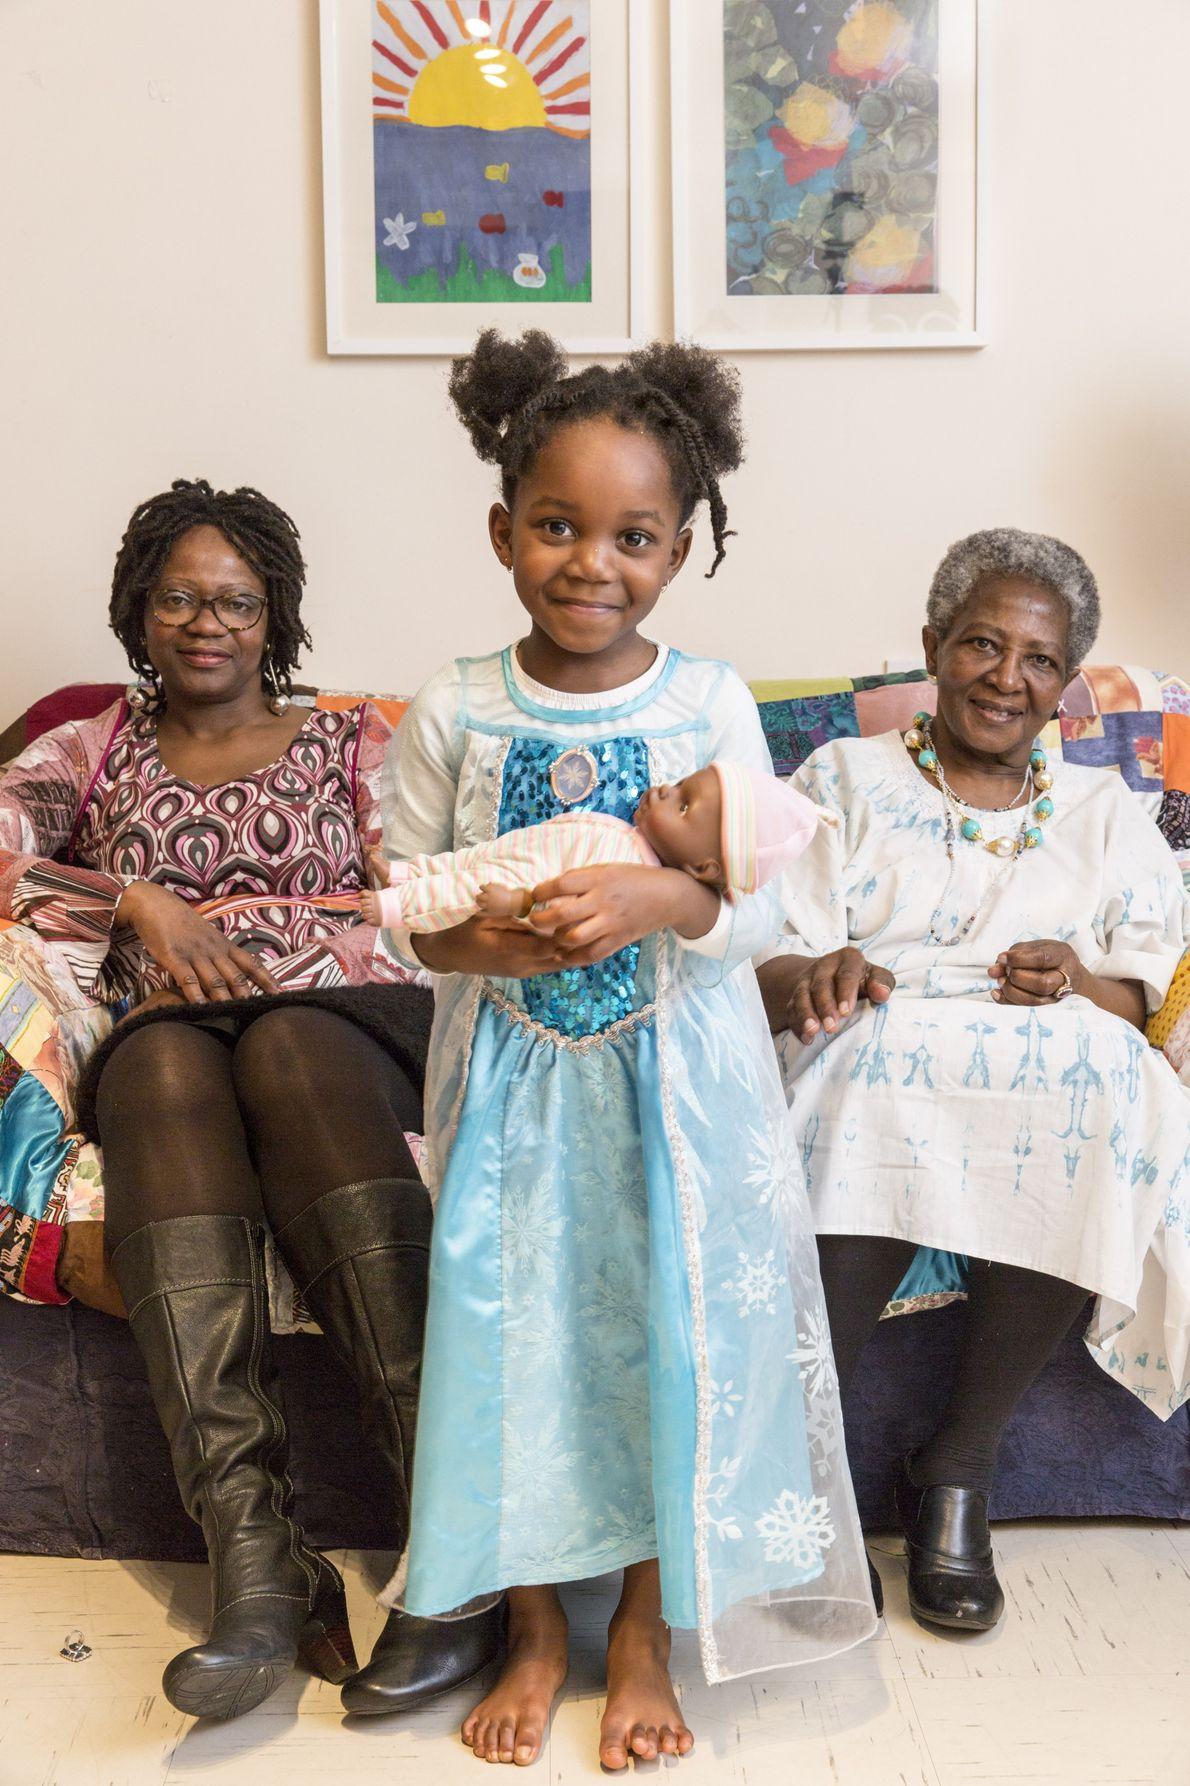 Angola: Felicia Luvumba with her mother, Judite, and her granddaughter, Shaiyarna.